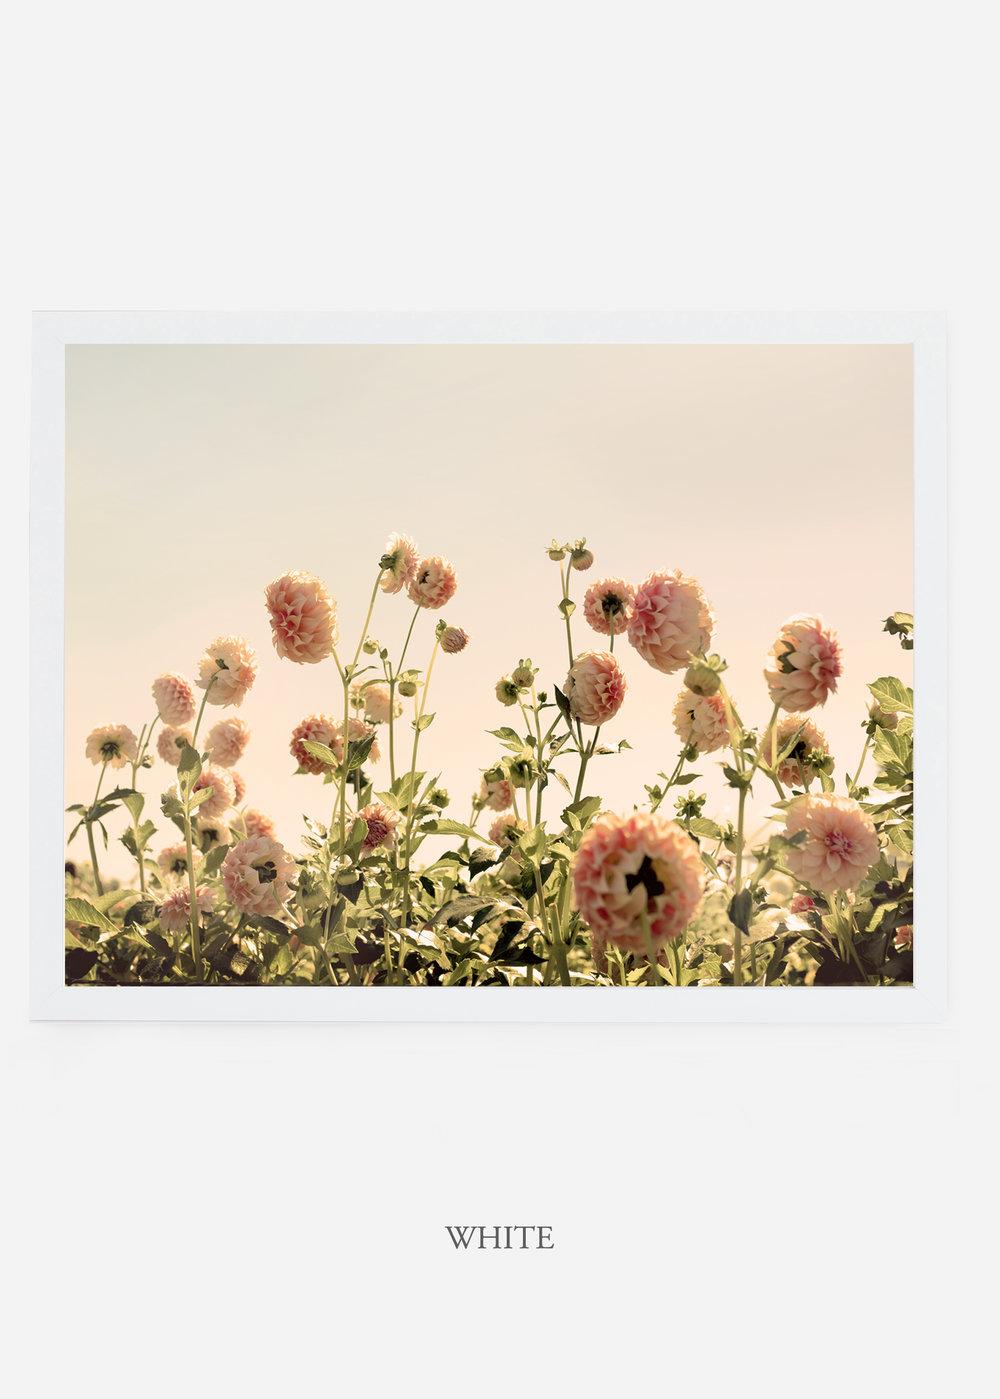 NoMat_WhiteFrame_DahliaNo.1_WilderCalifornia_Art_Floral_Homedecor_Prints_Dahlia_Botanical_Artwork_Interiordesign.jpg